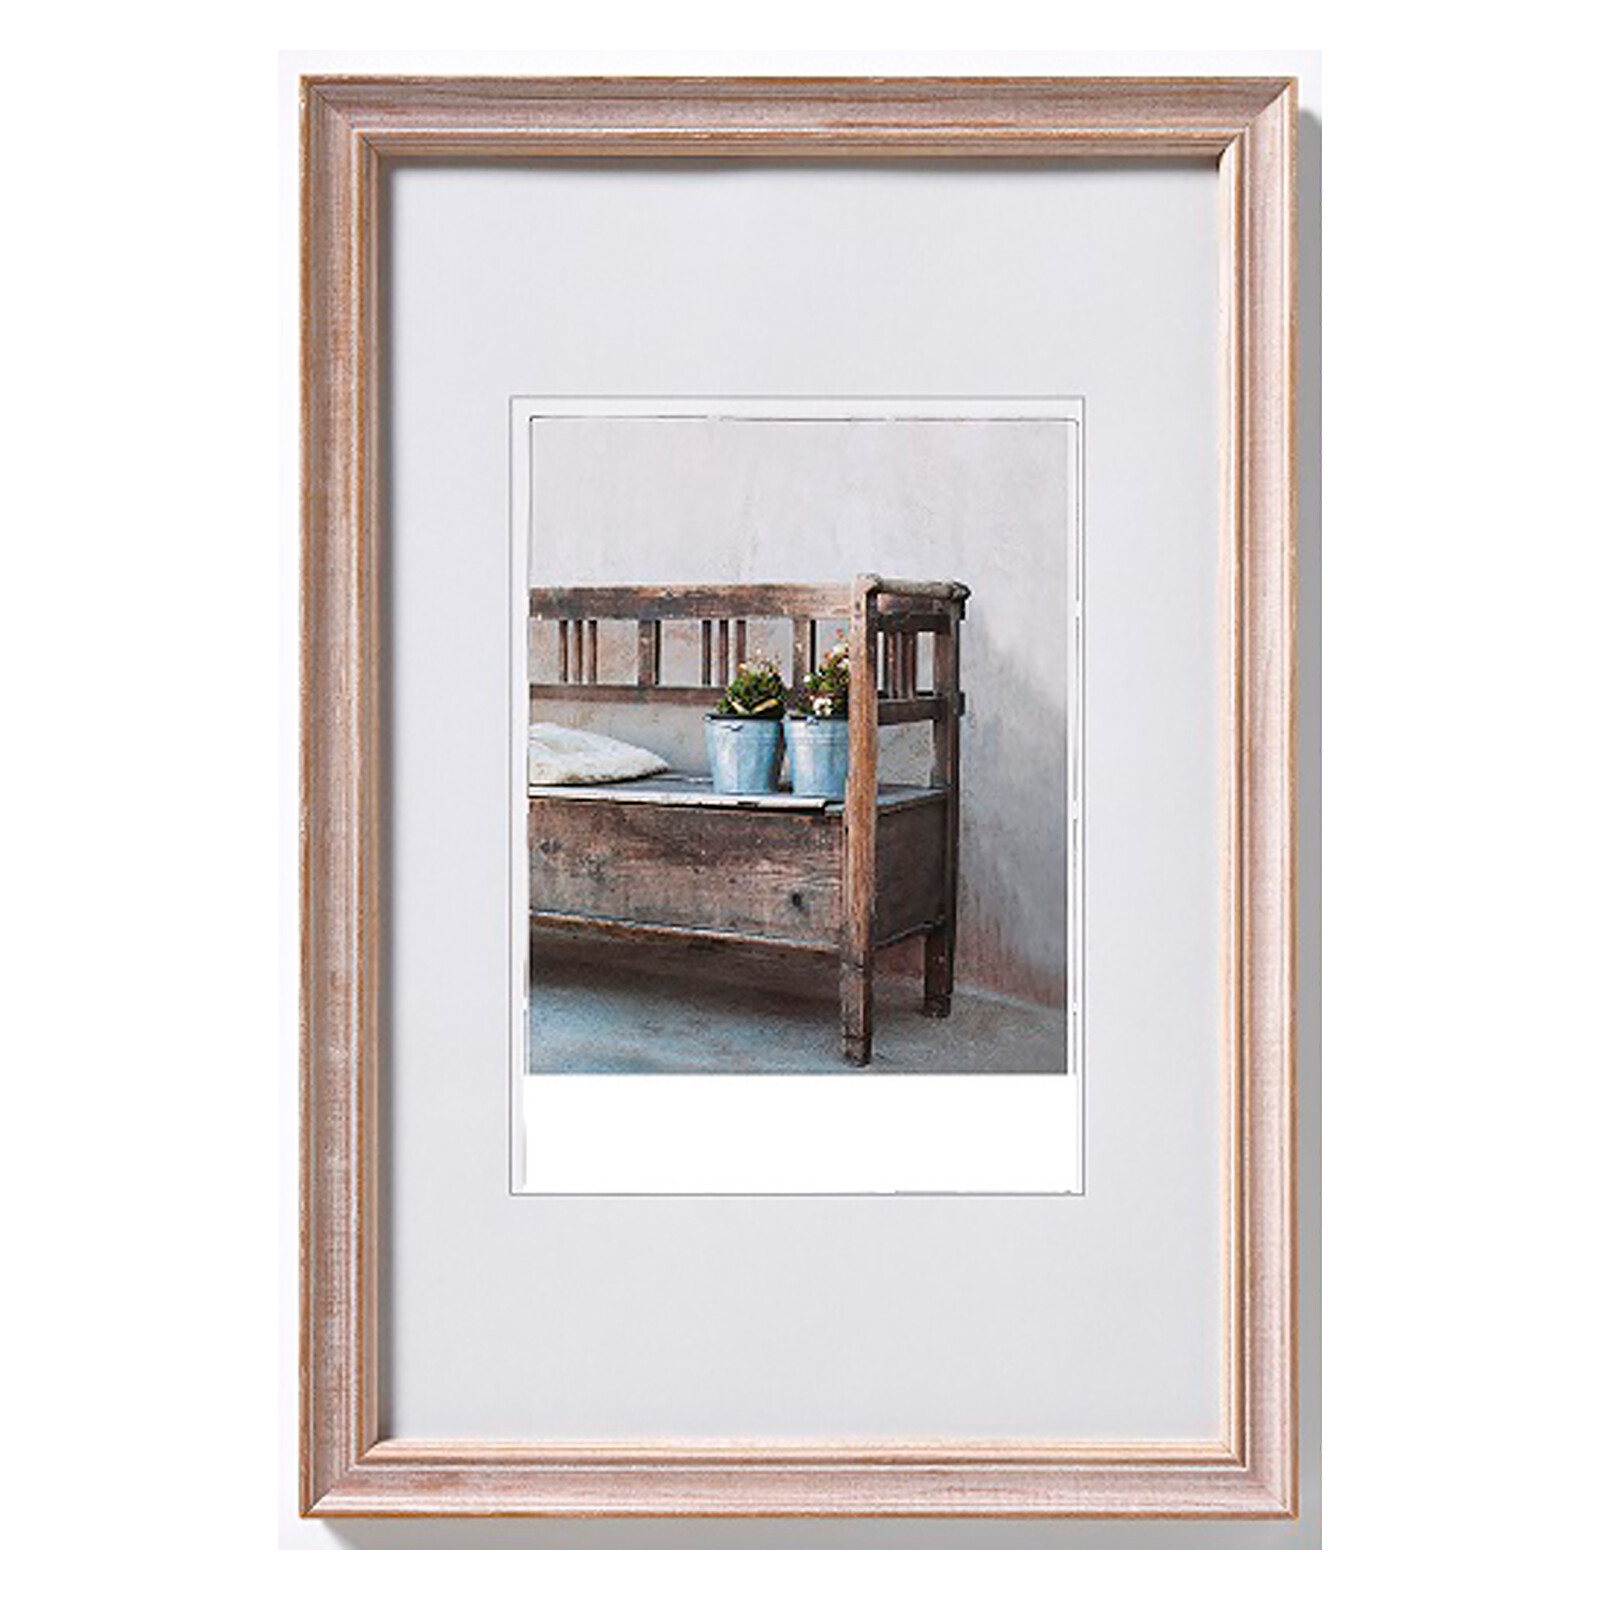 Bilderrahmen Bench 10x15cm Holz braun